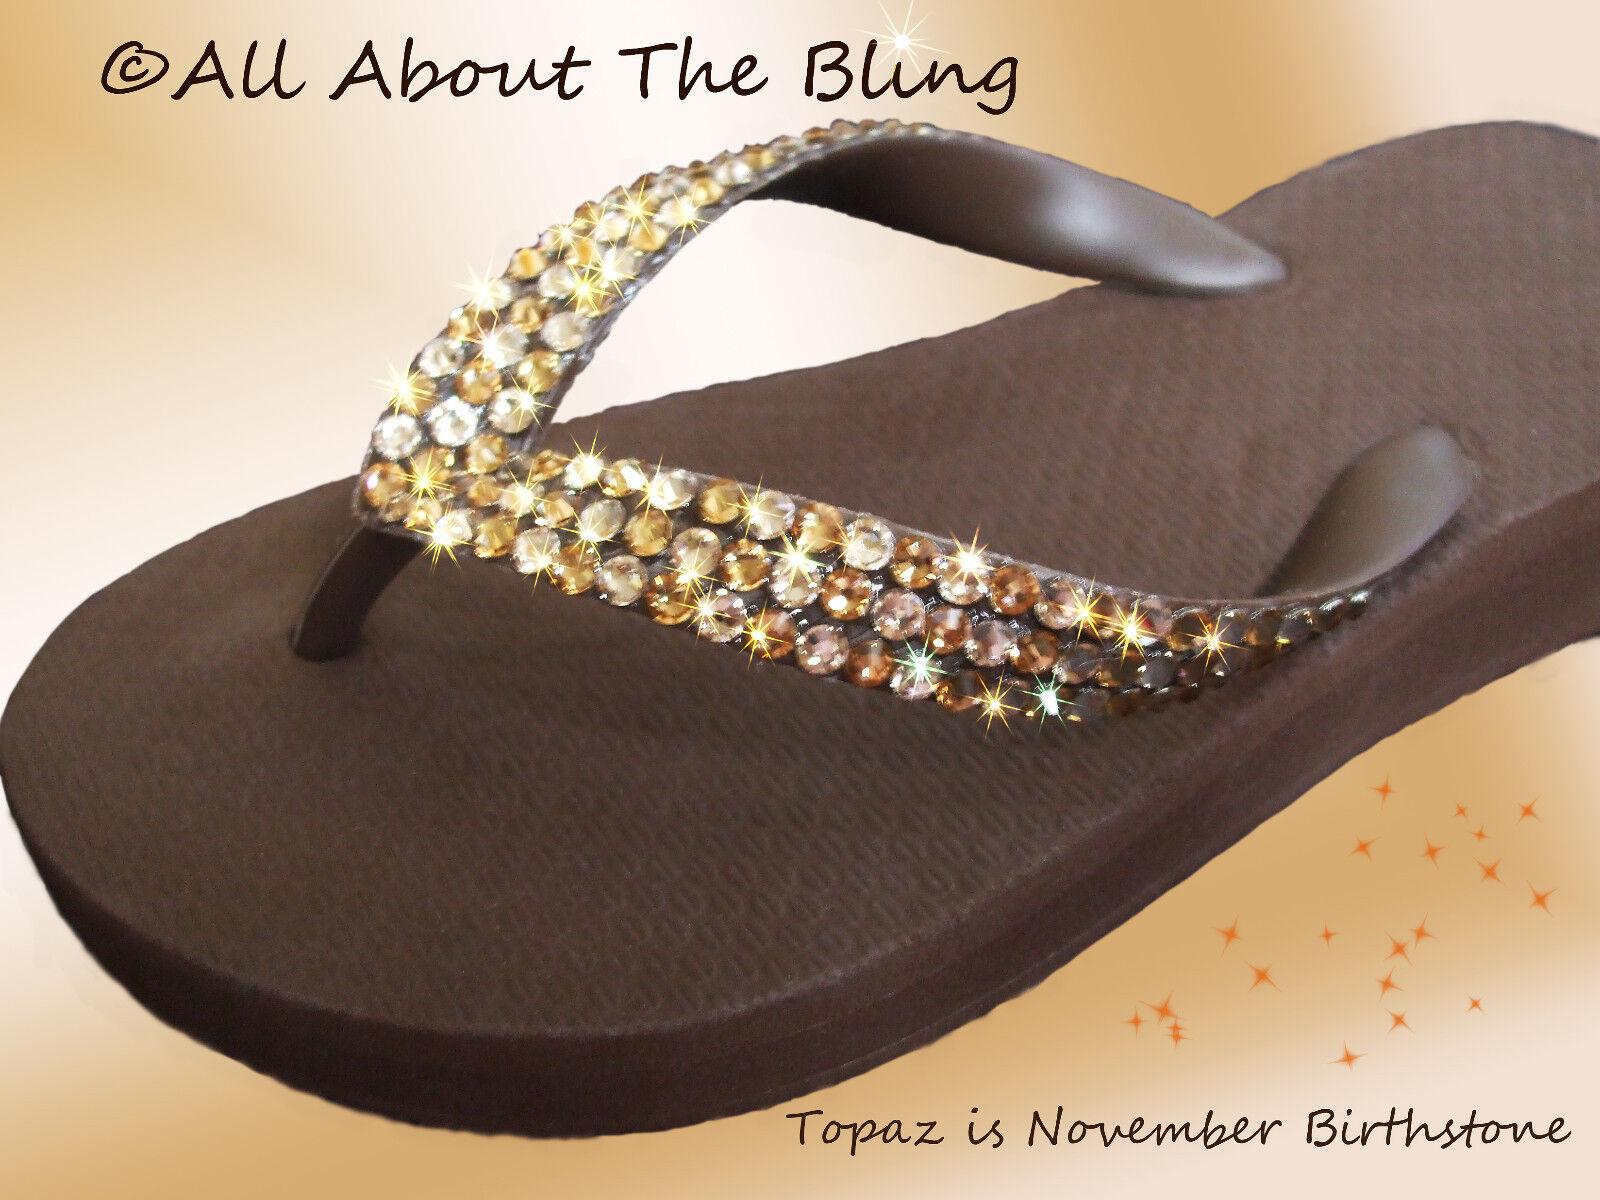 Crystal Havaianas Marroneee flip flops or Wedge with SWAROVSKI CRYSTALS Topaz & Silk